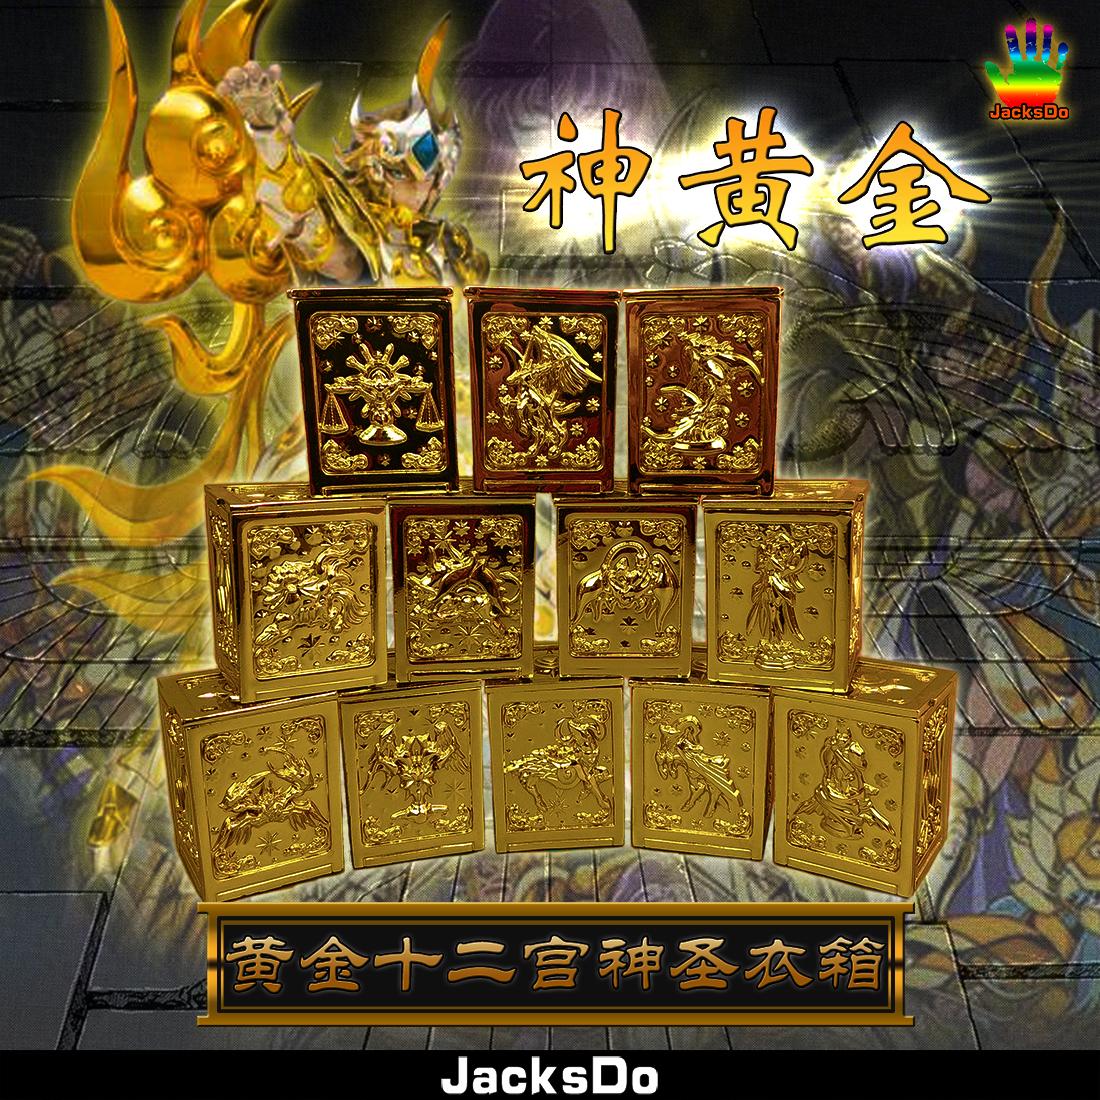 JacksDo_box_gold_kamu_roki_inask_028.jpg